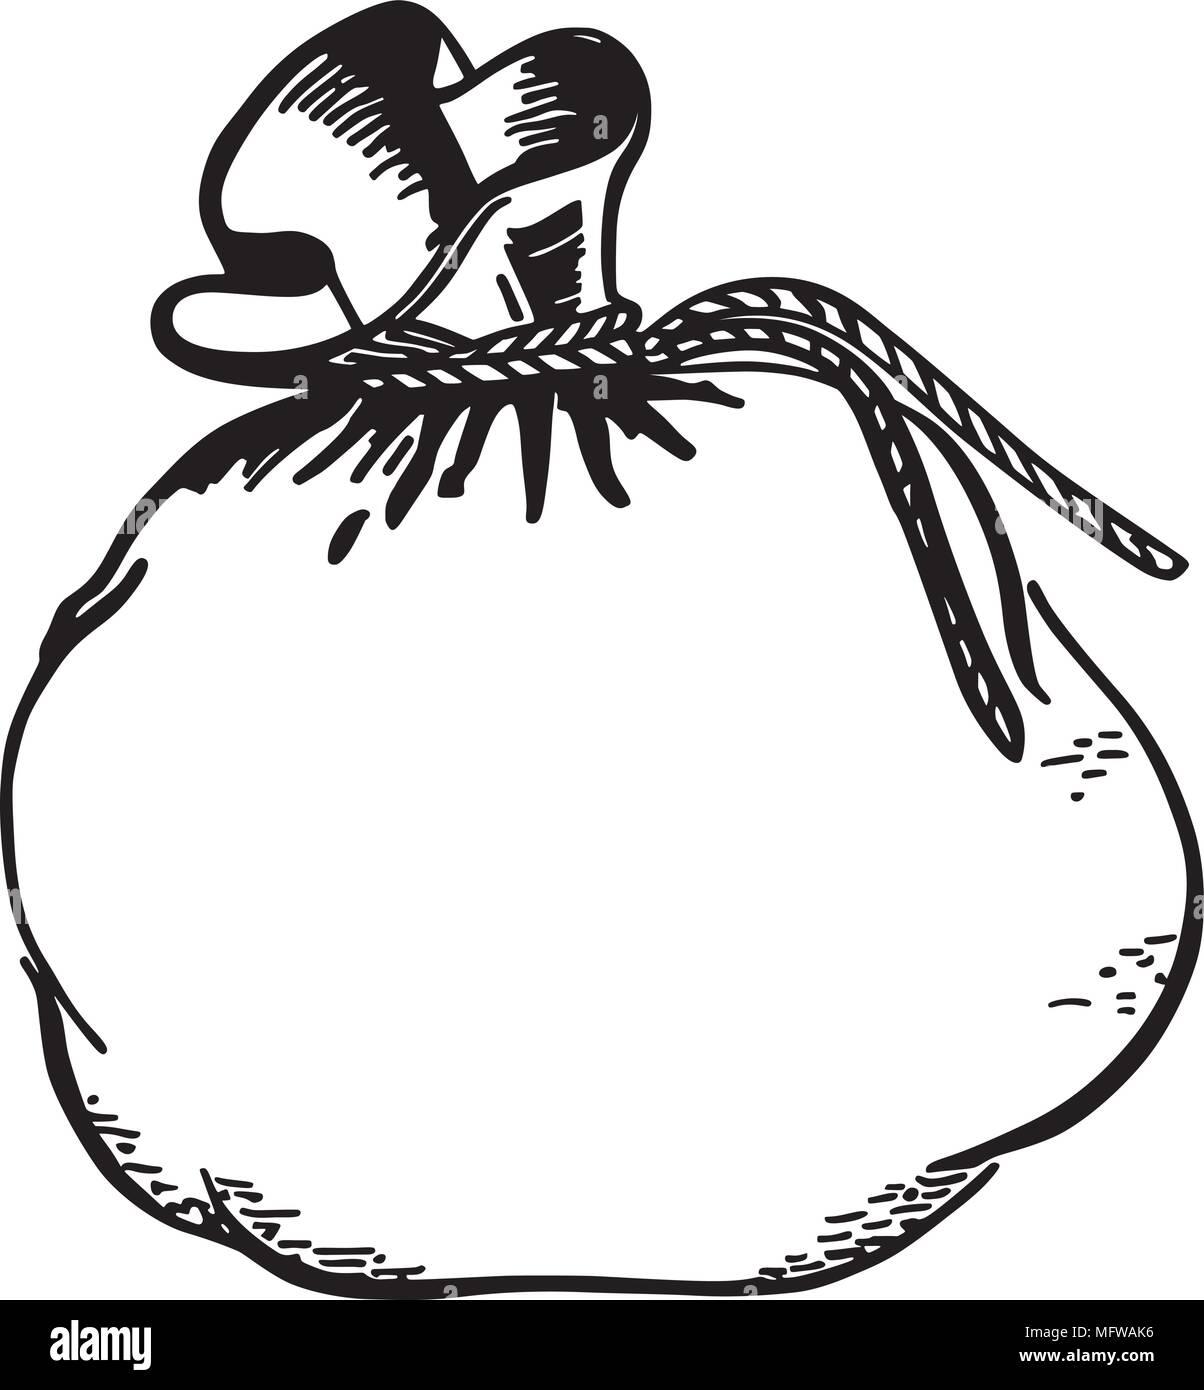 Money Bag - Retro Clipart Illustration - Stock Vector